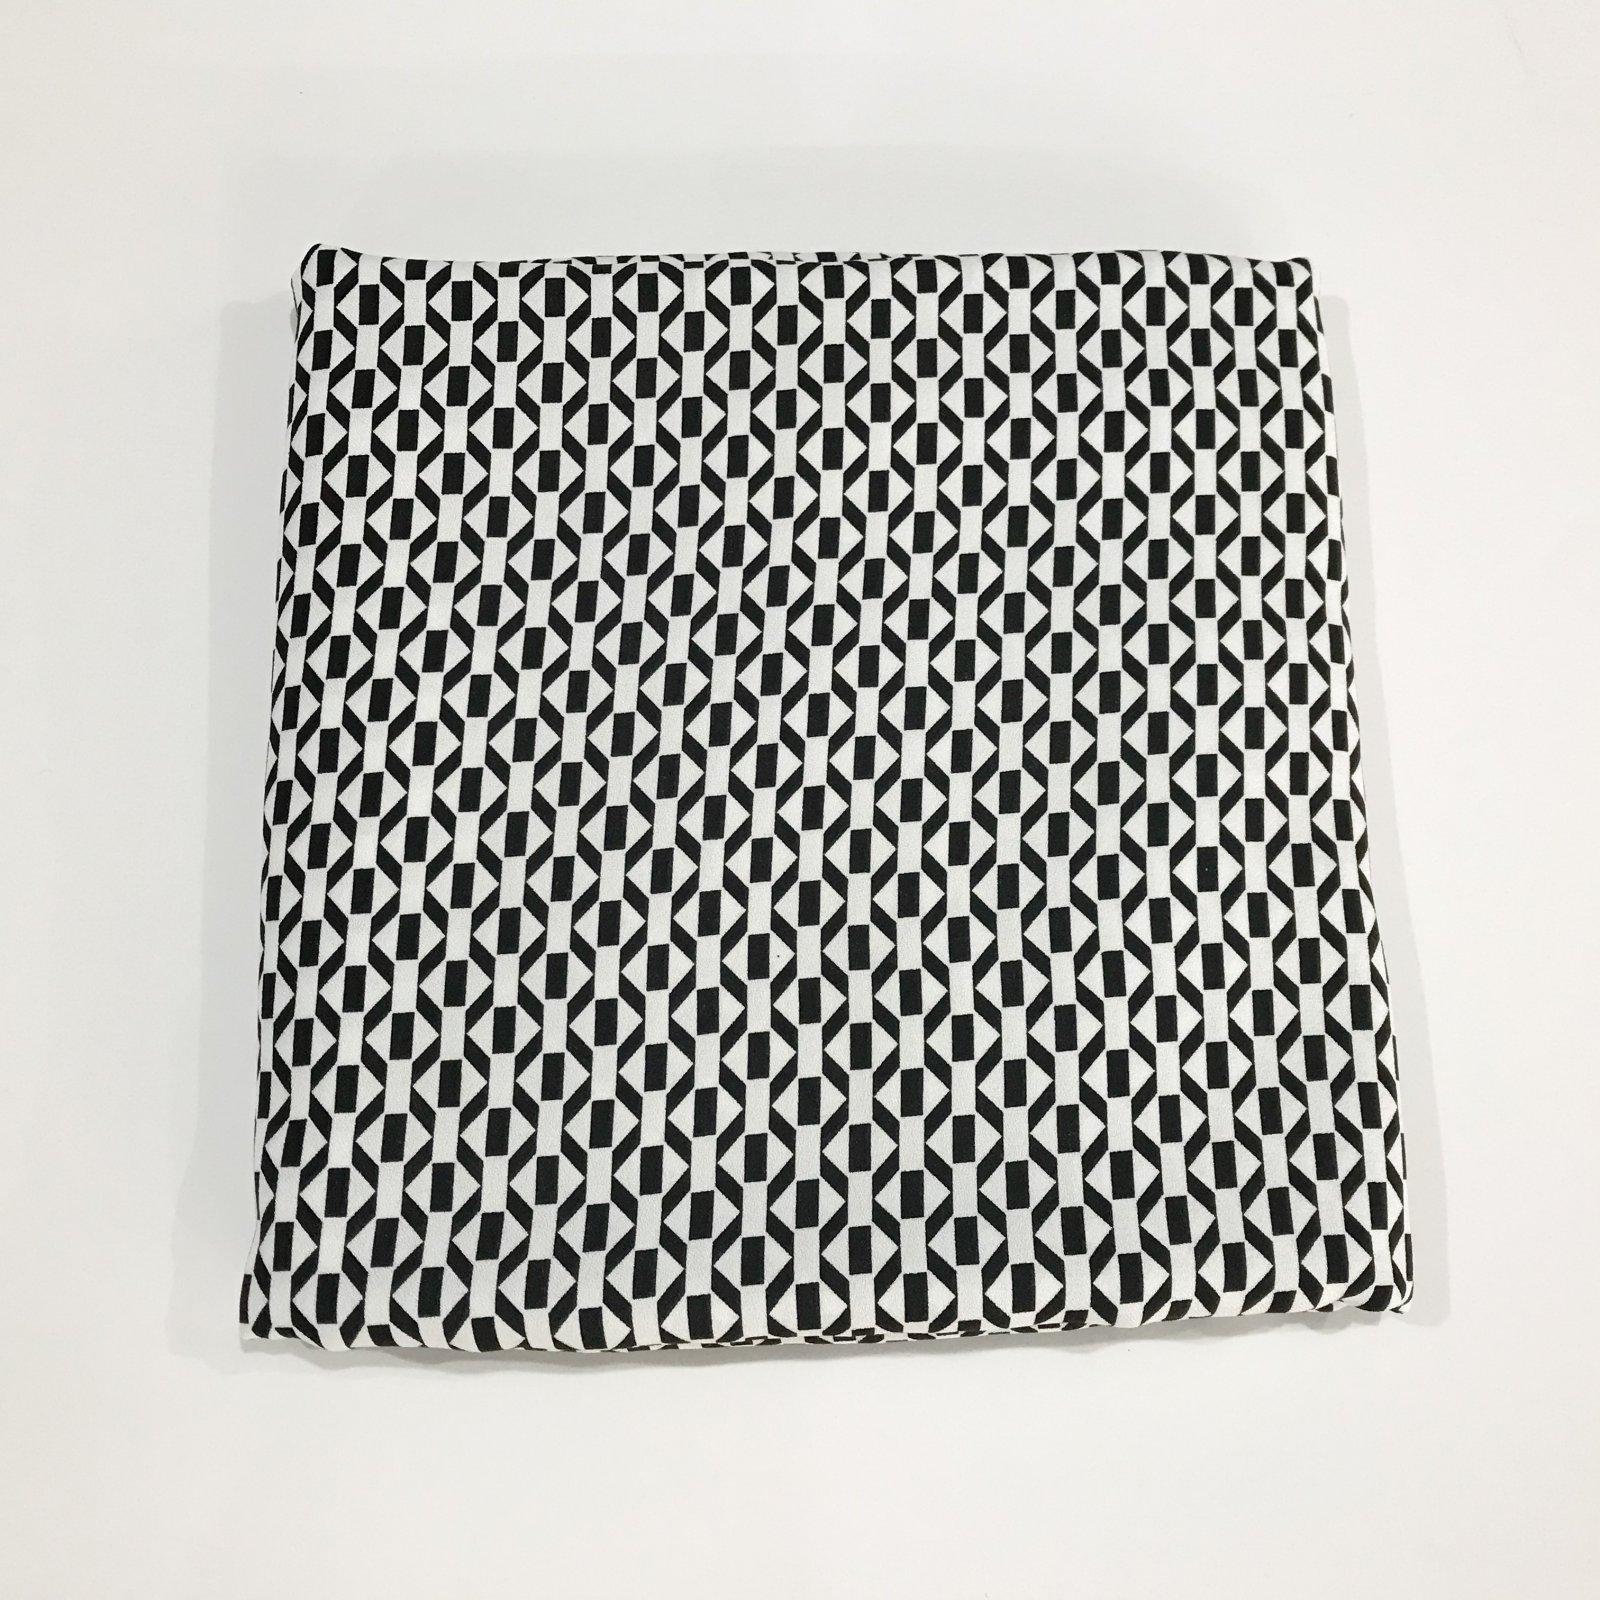 2 yards - Viscose Crepe - Geometric Black and White